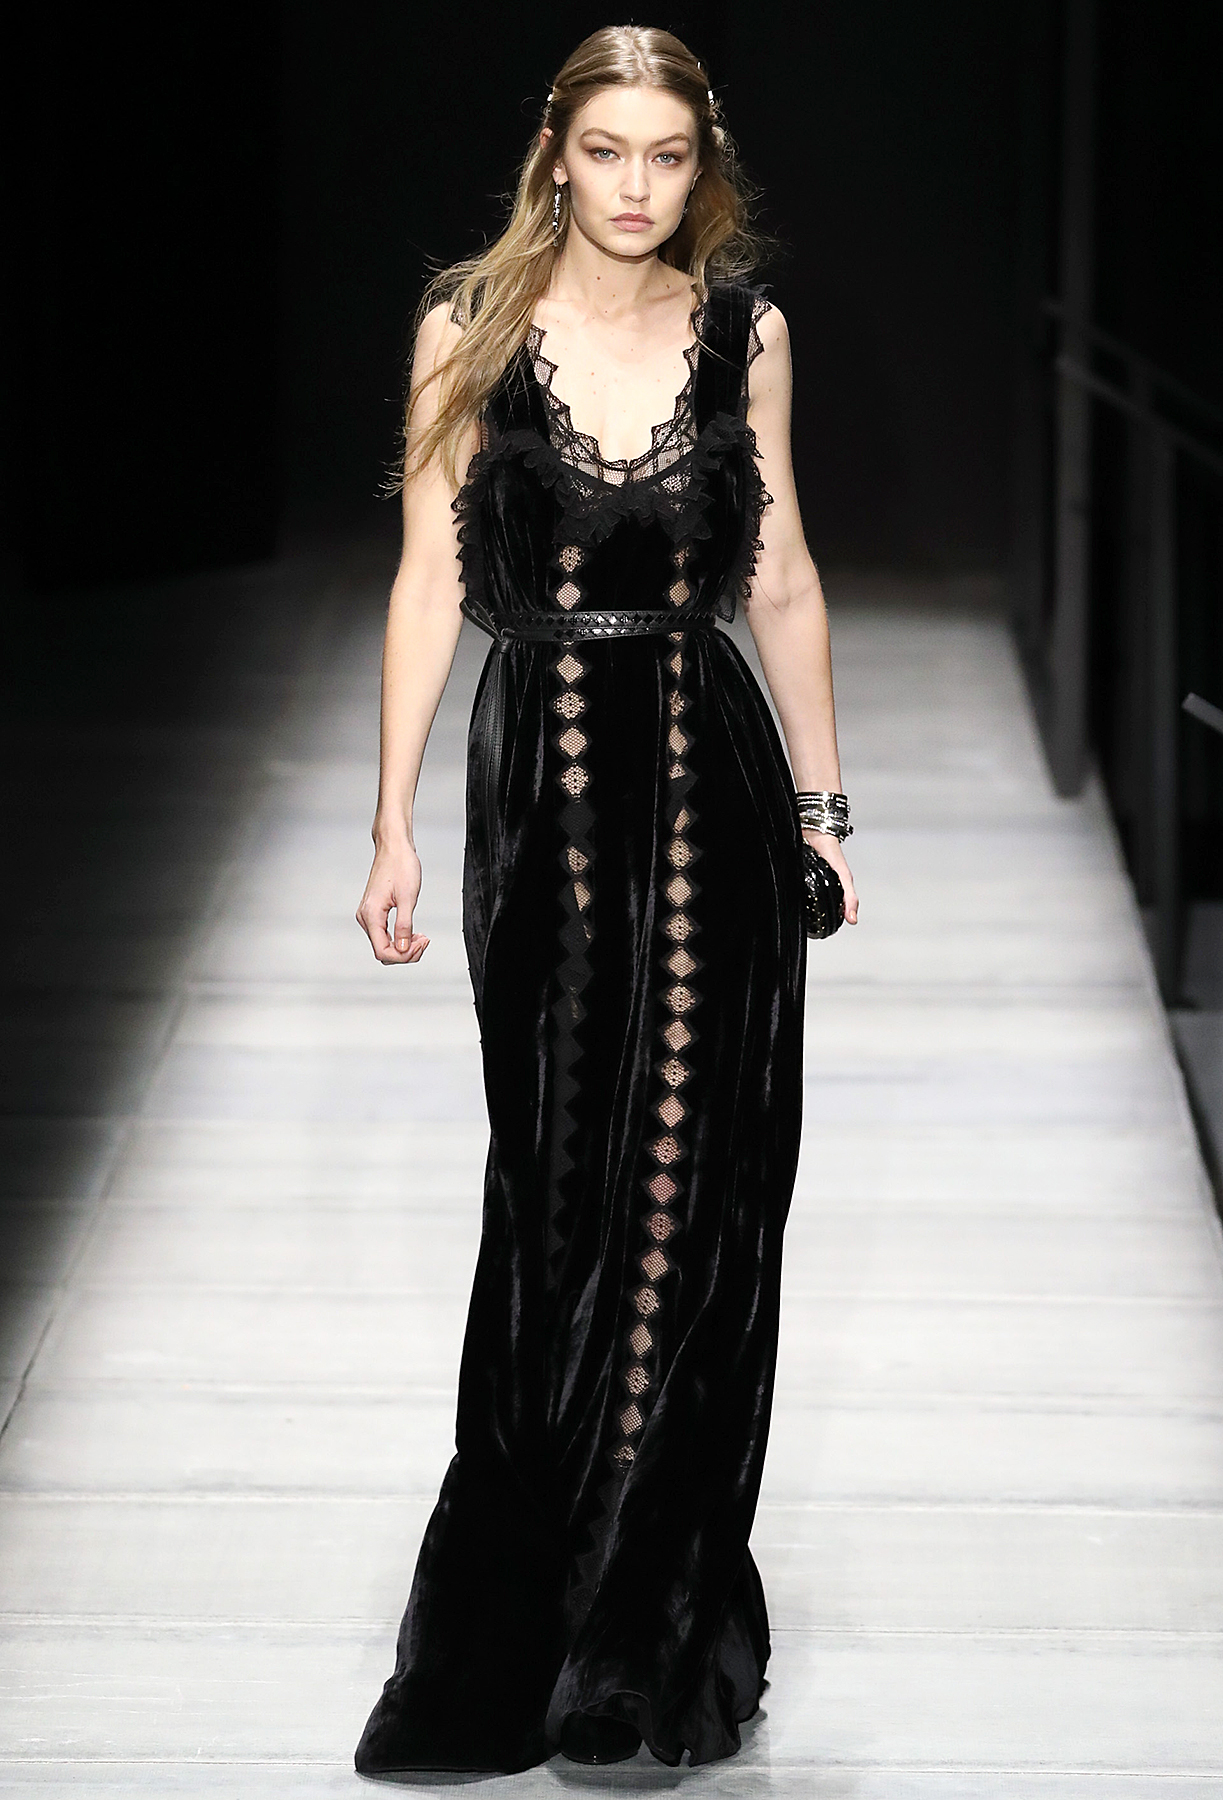 Gigi Hadid Bottega Veneta Fall/Winter 2018 Collection New York Fashion Week